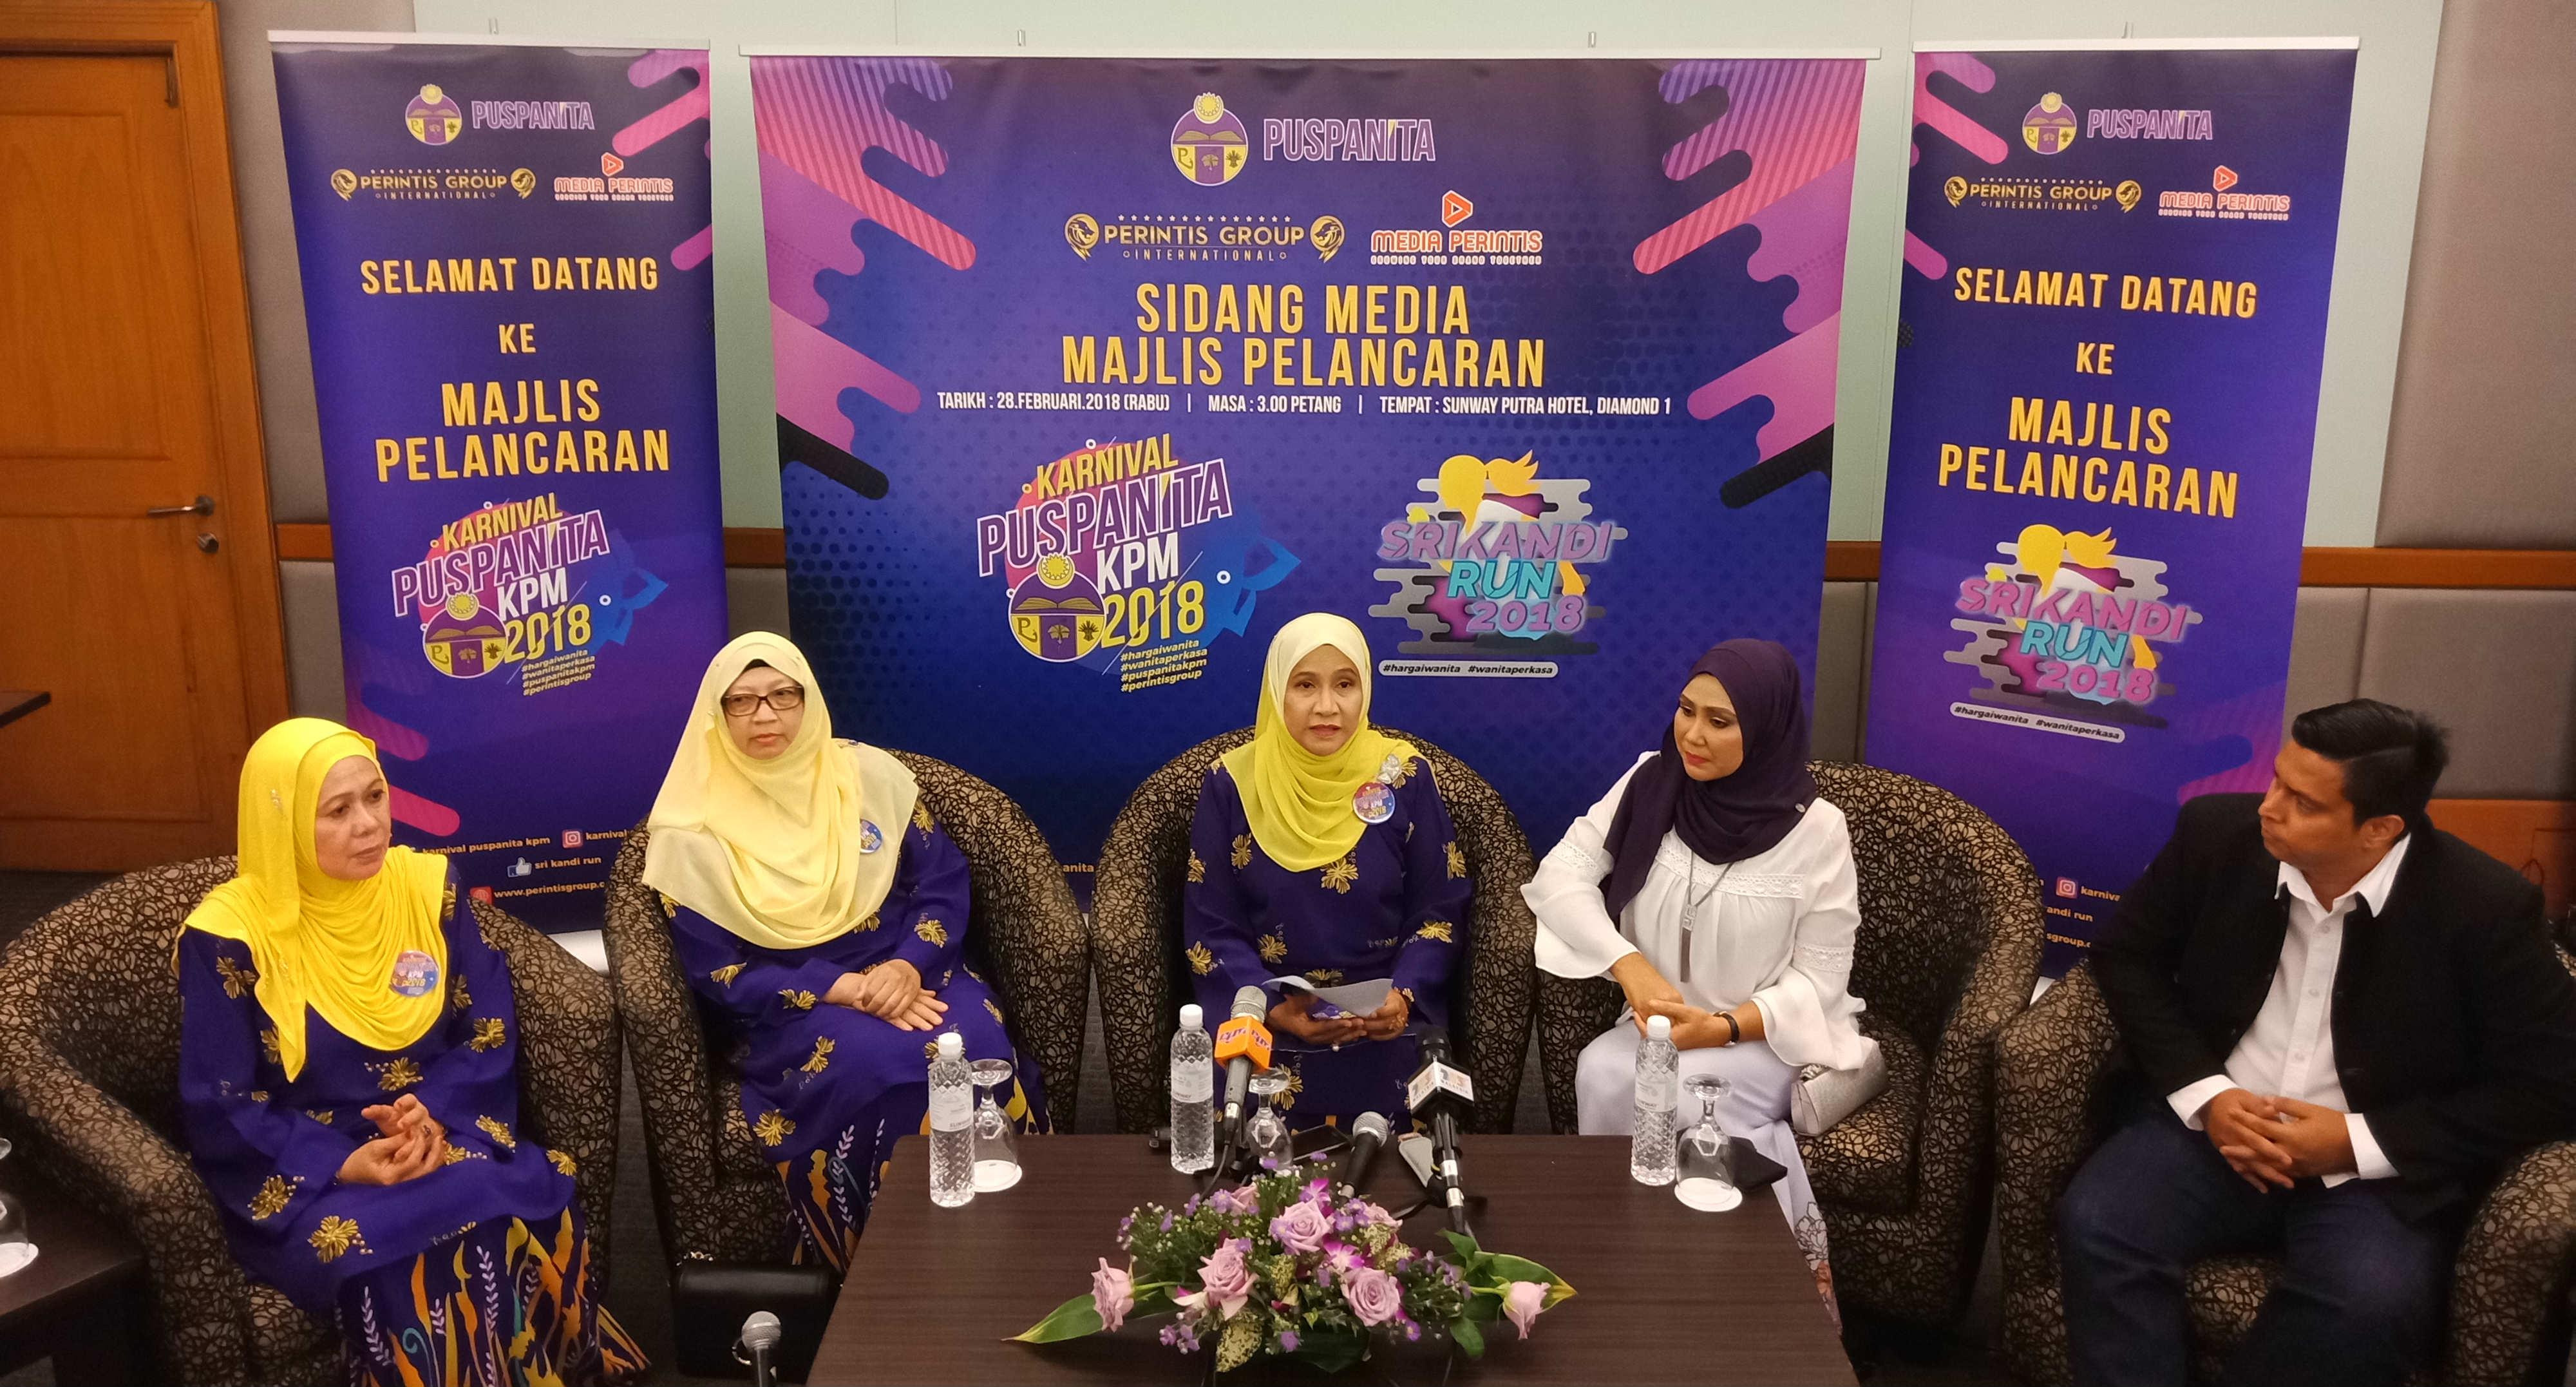 Sidang media Karnival PUSPANITA KPM 2018